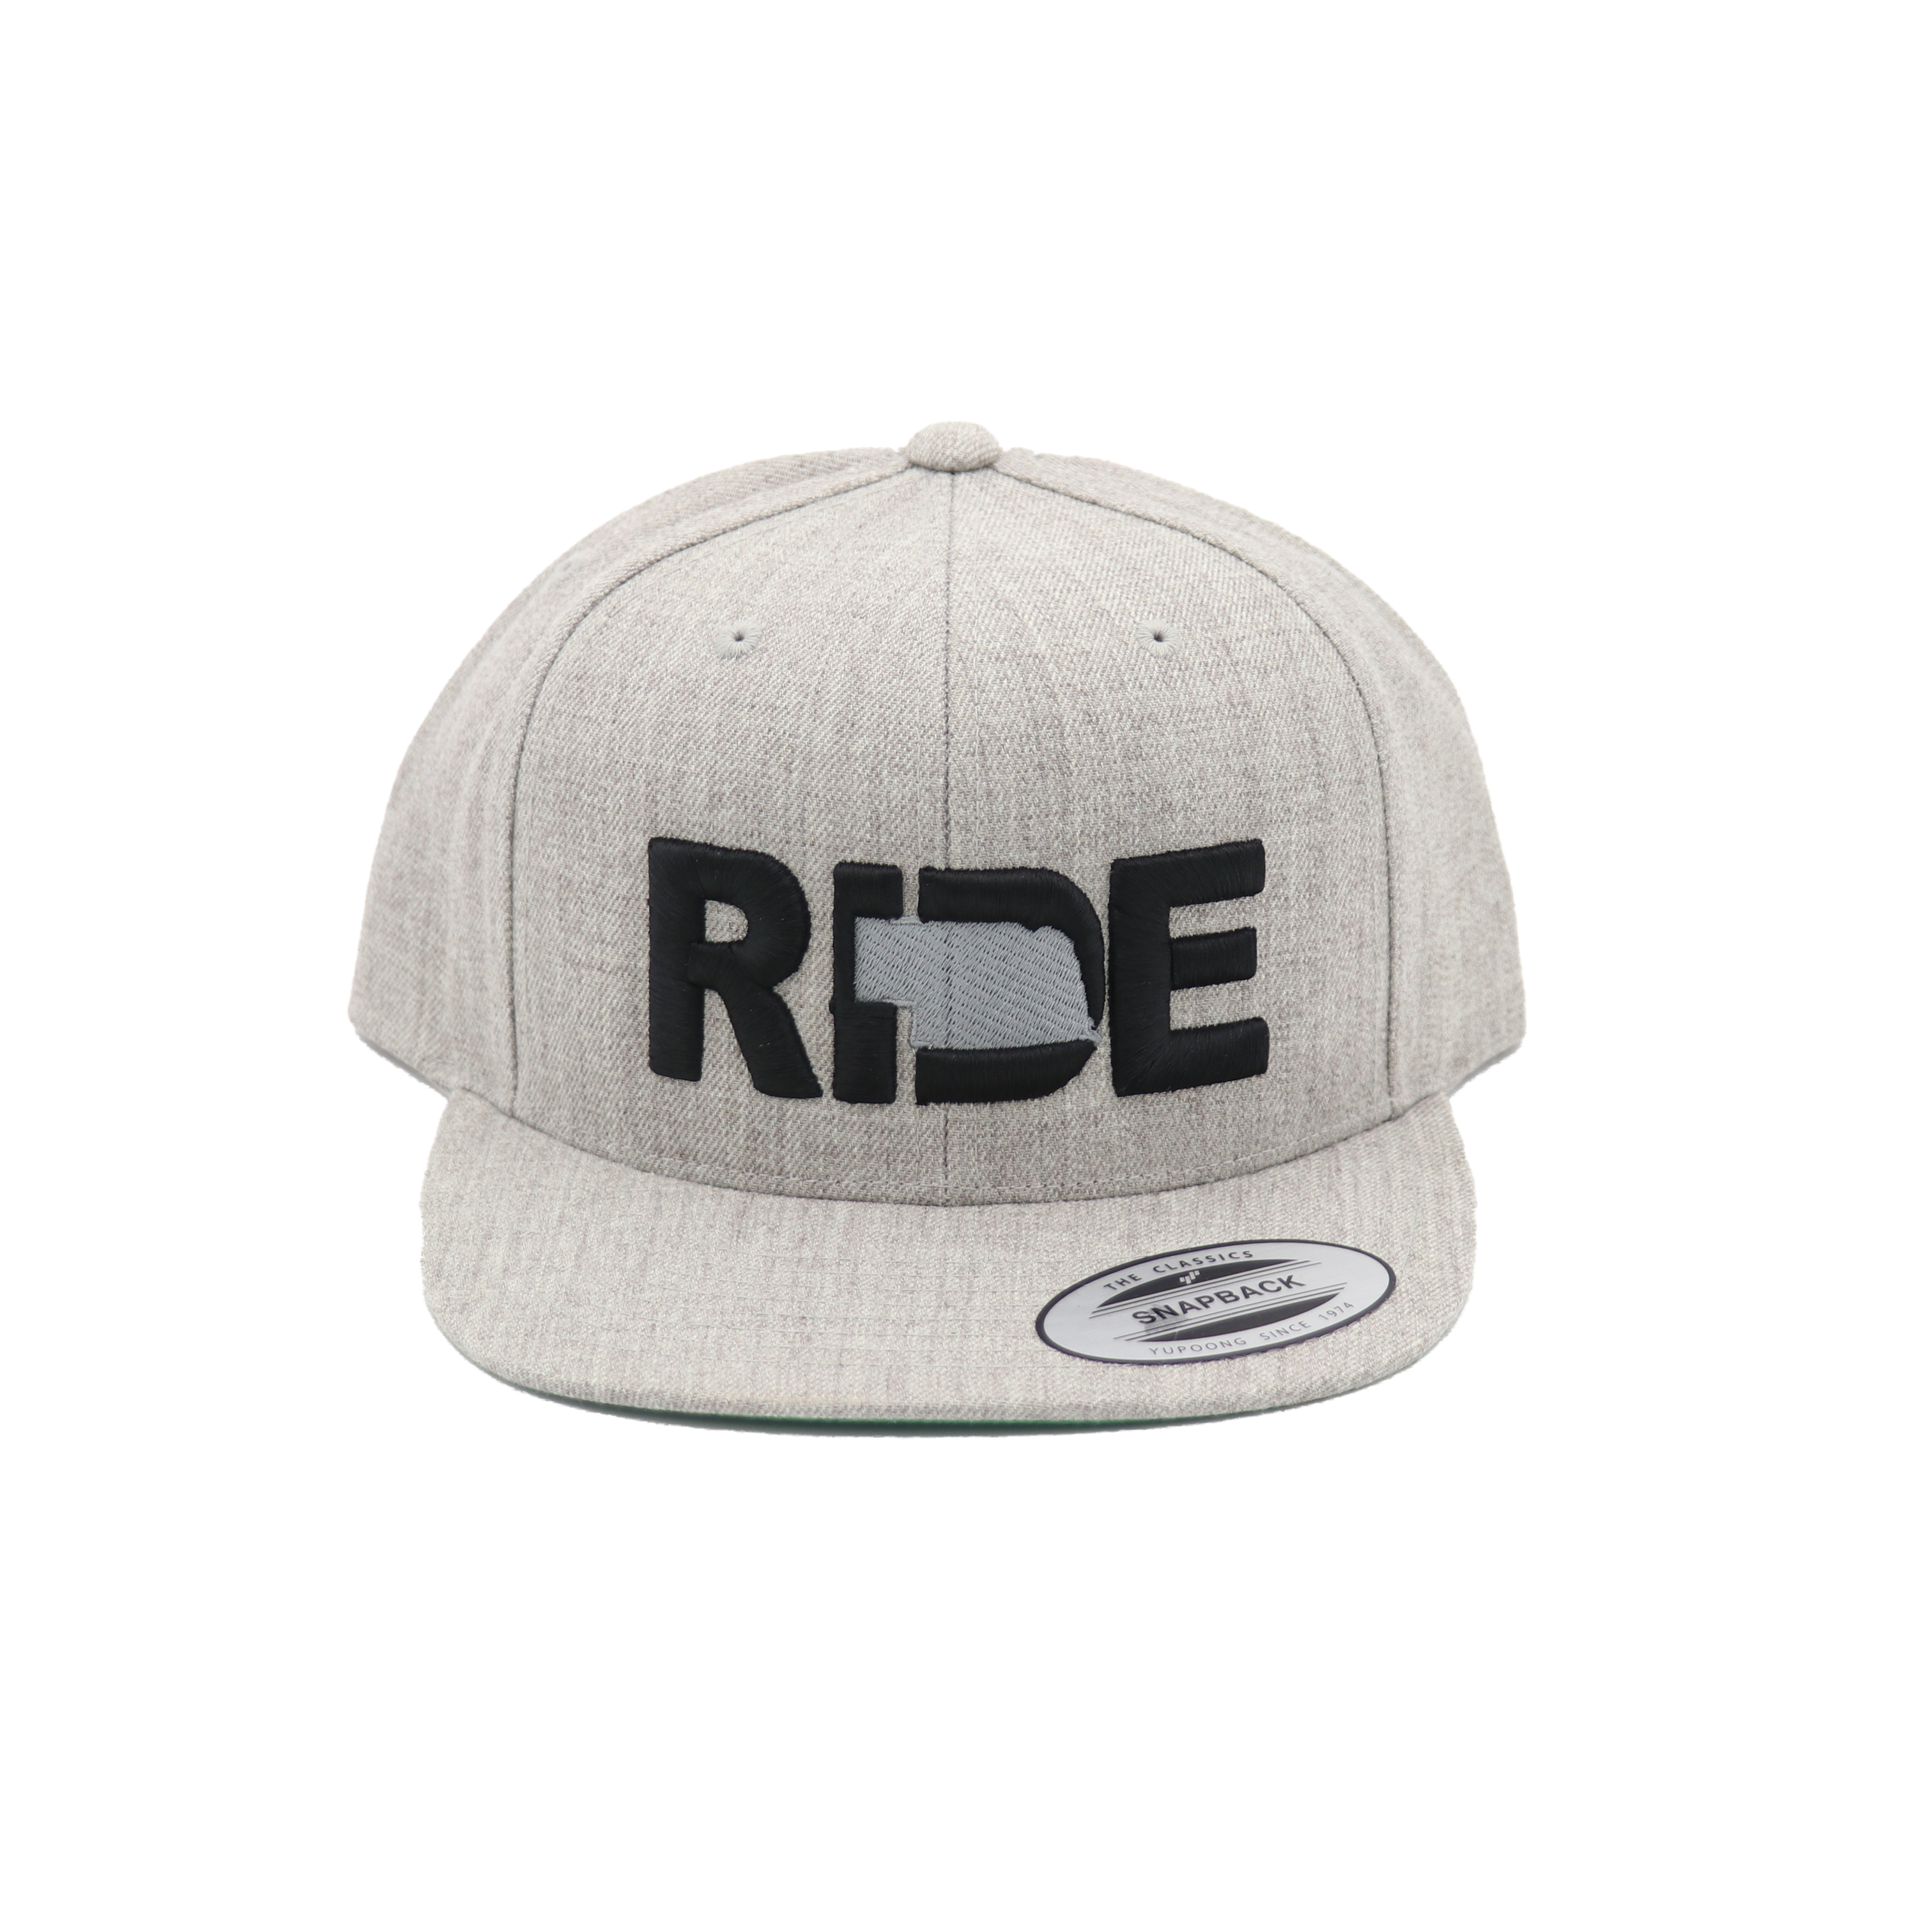 Ride Nebraska Classic Embroidered  Snapback Flat Brim Hat Gray/Black